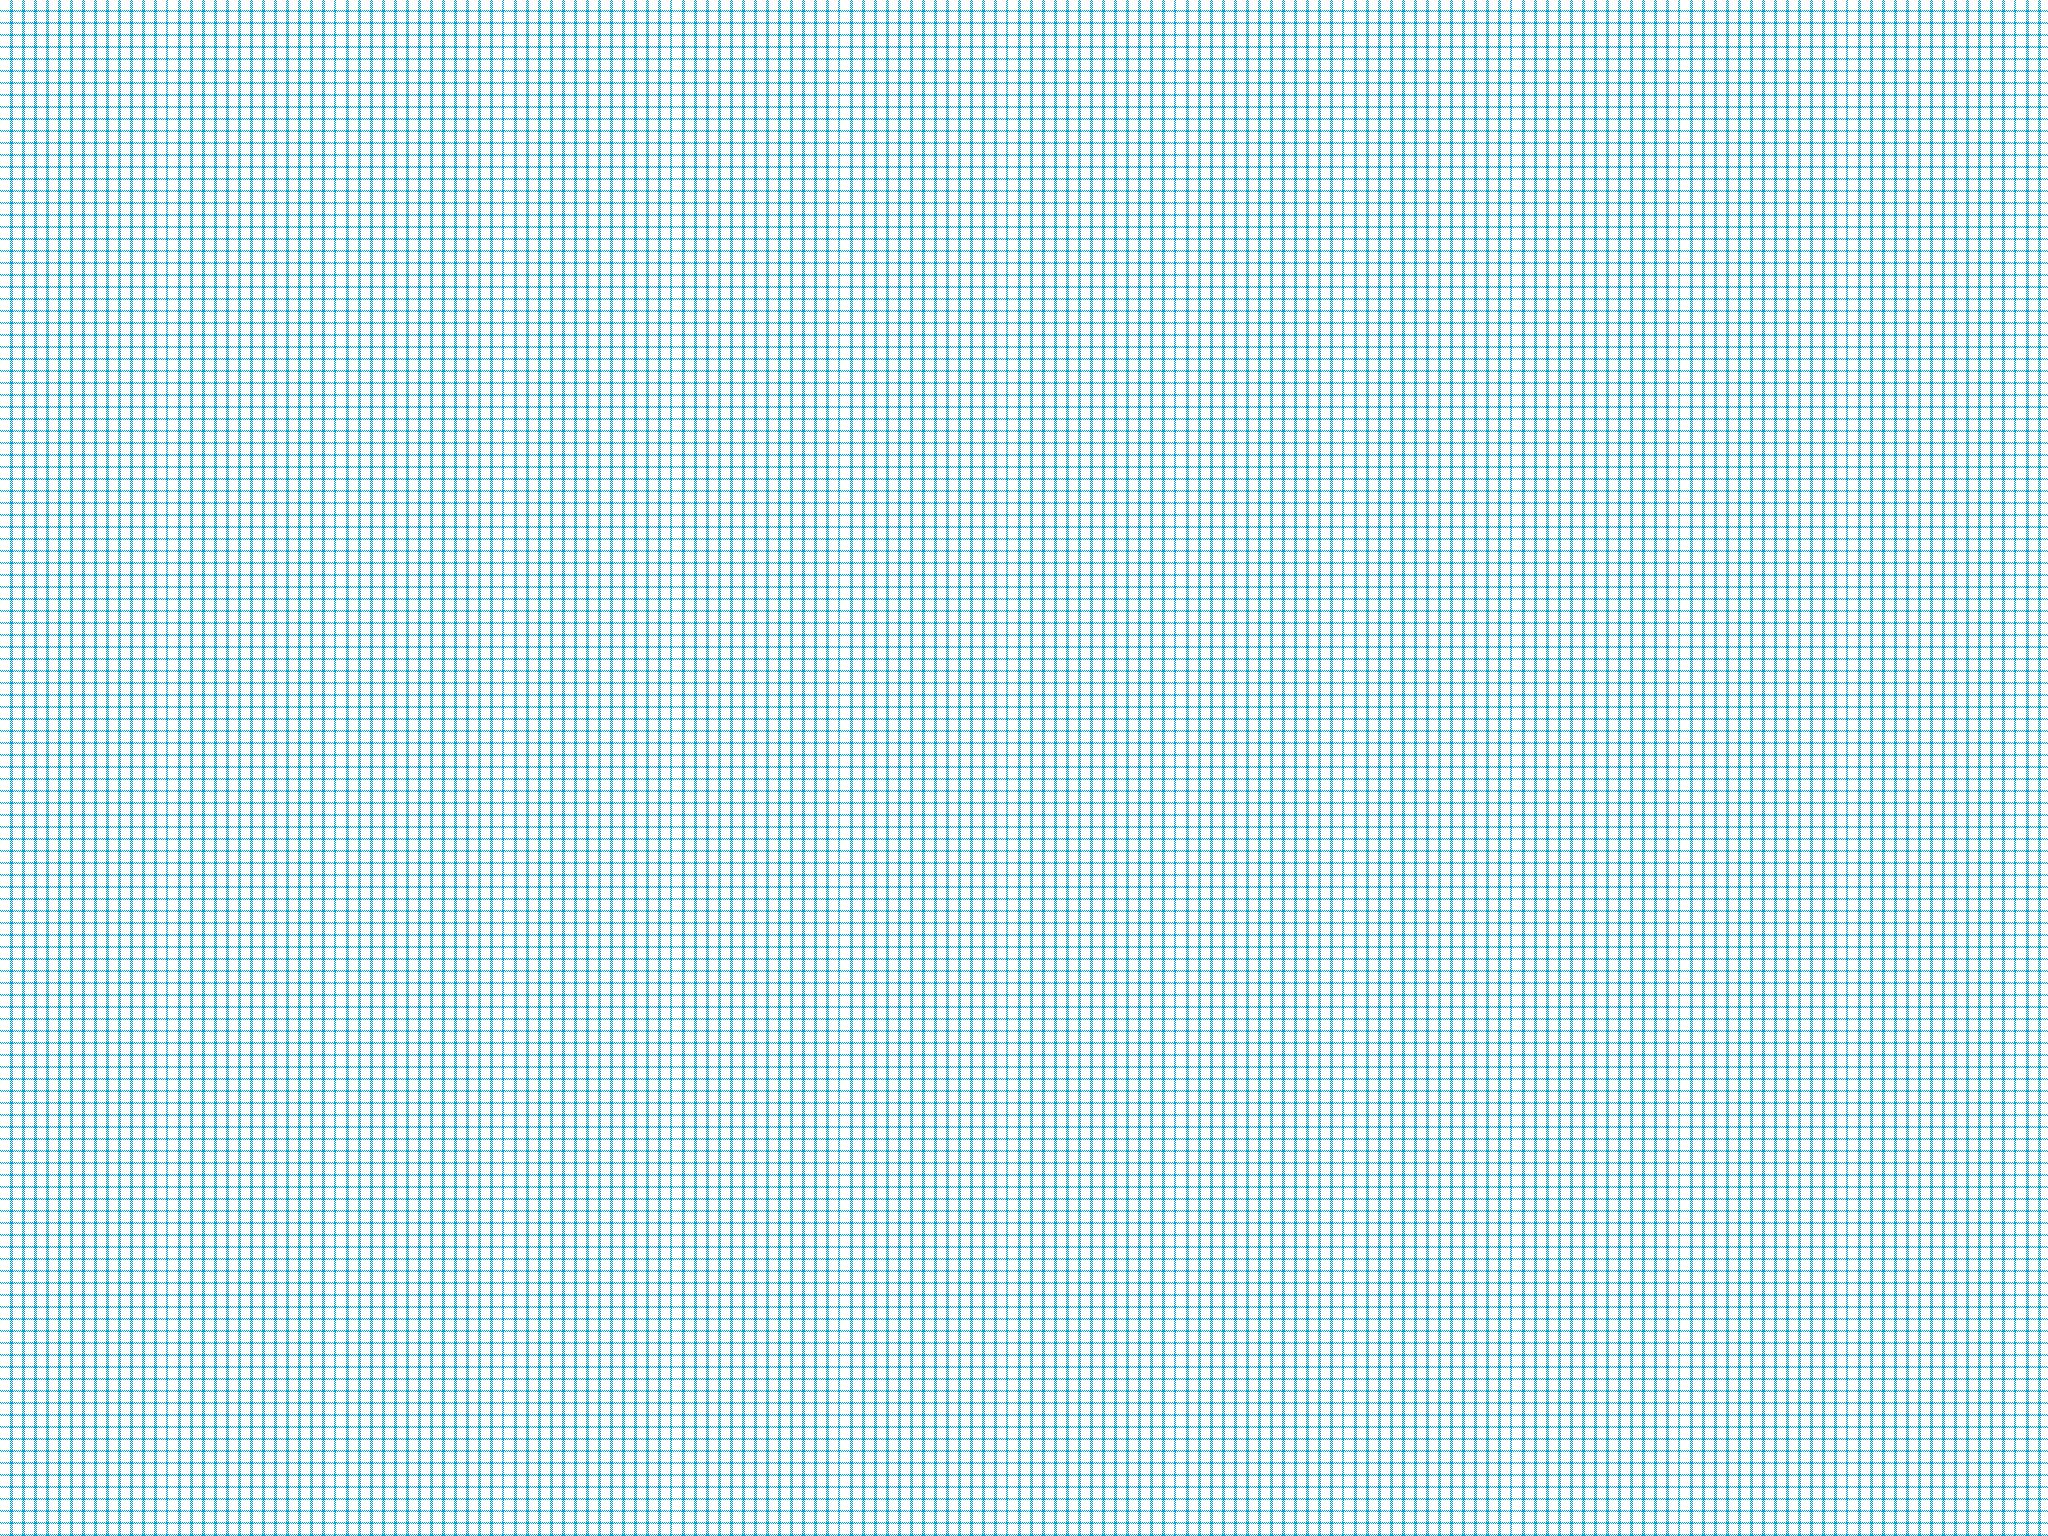 graph paper wallpaper